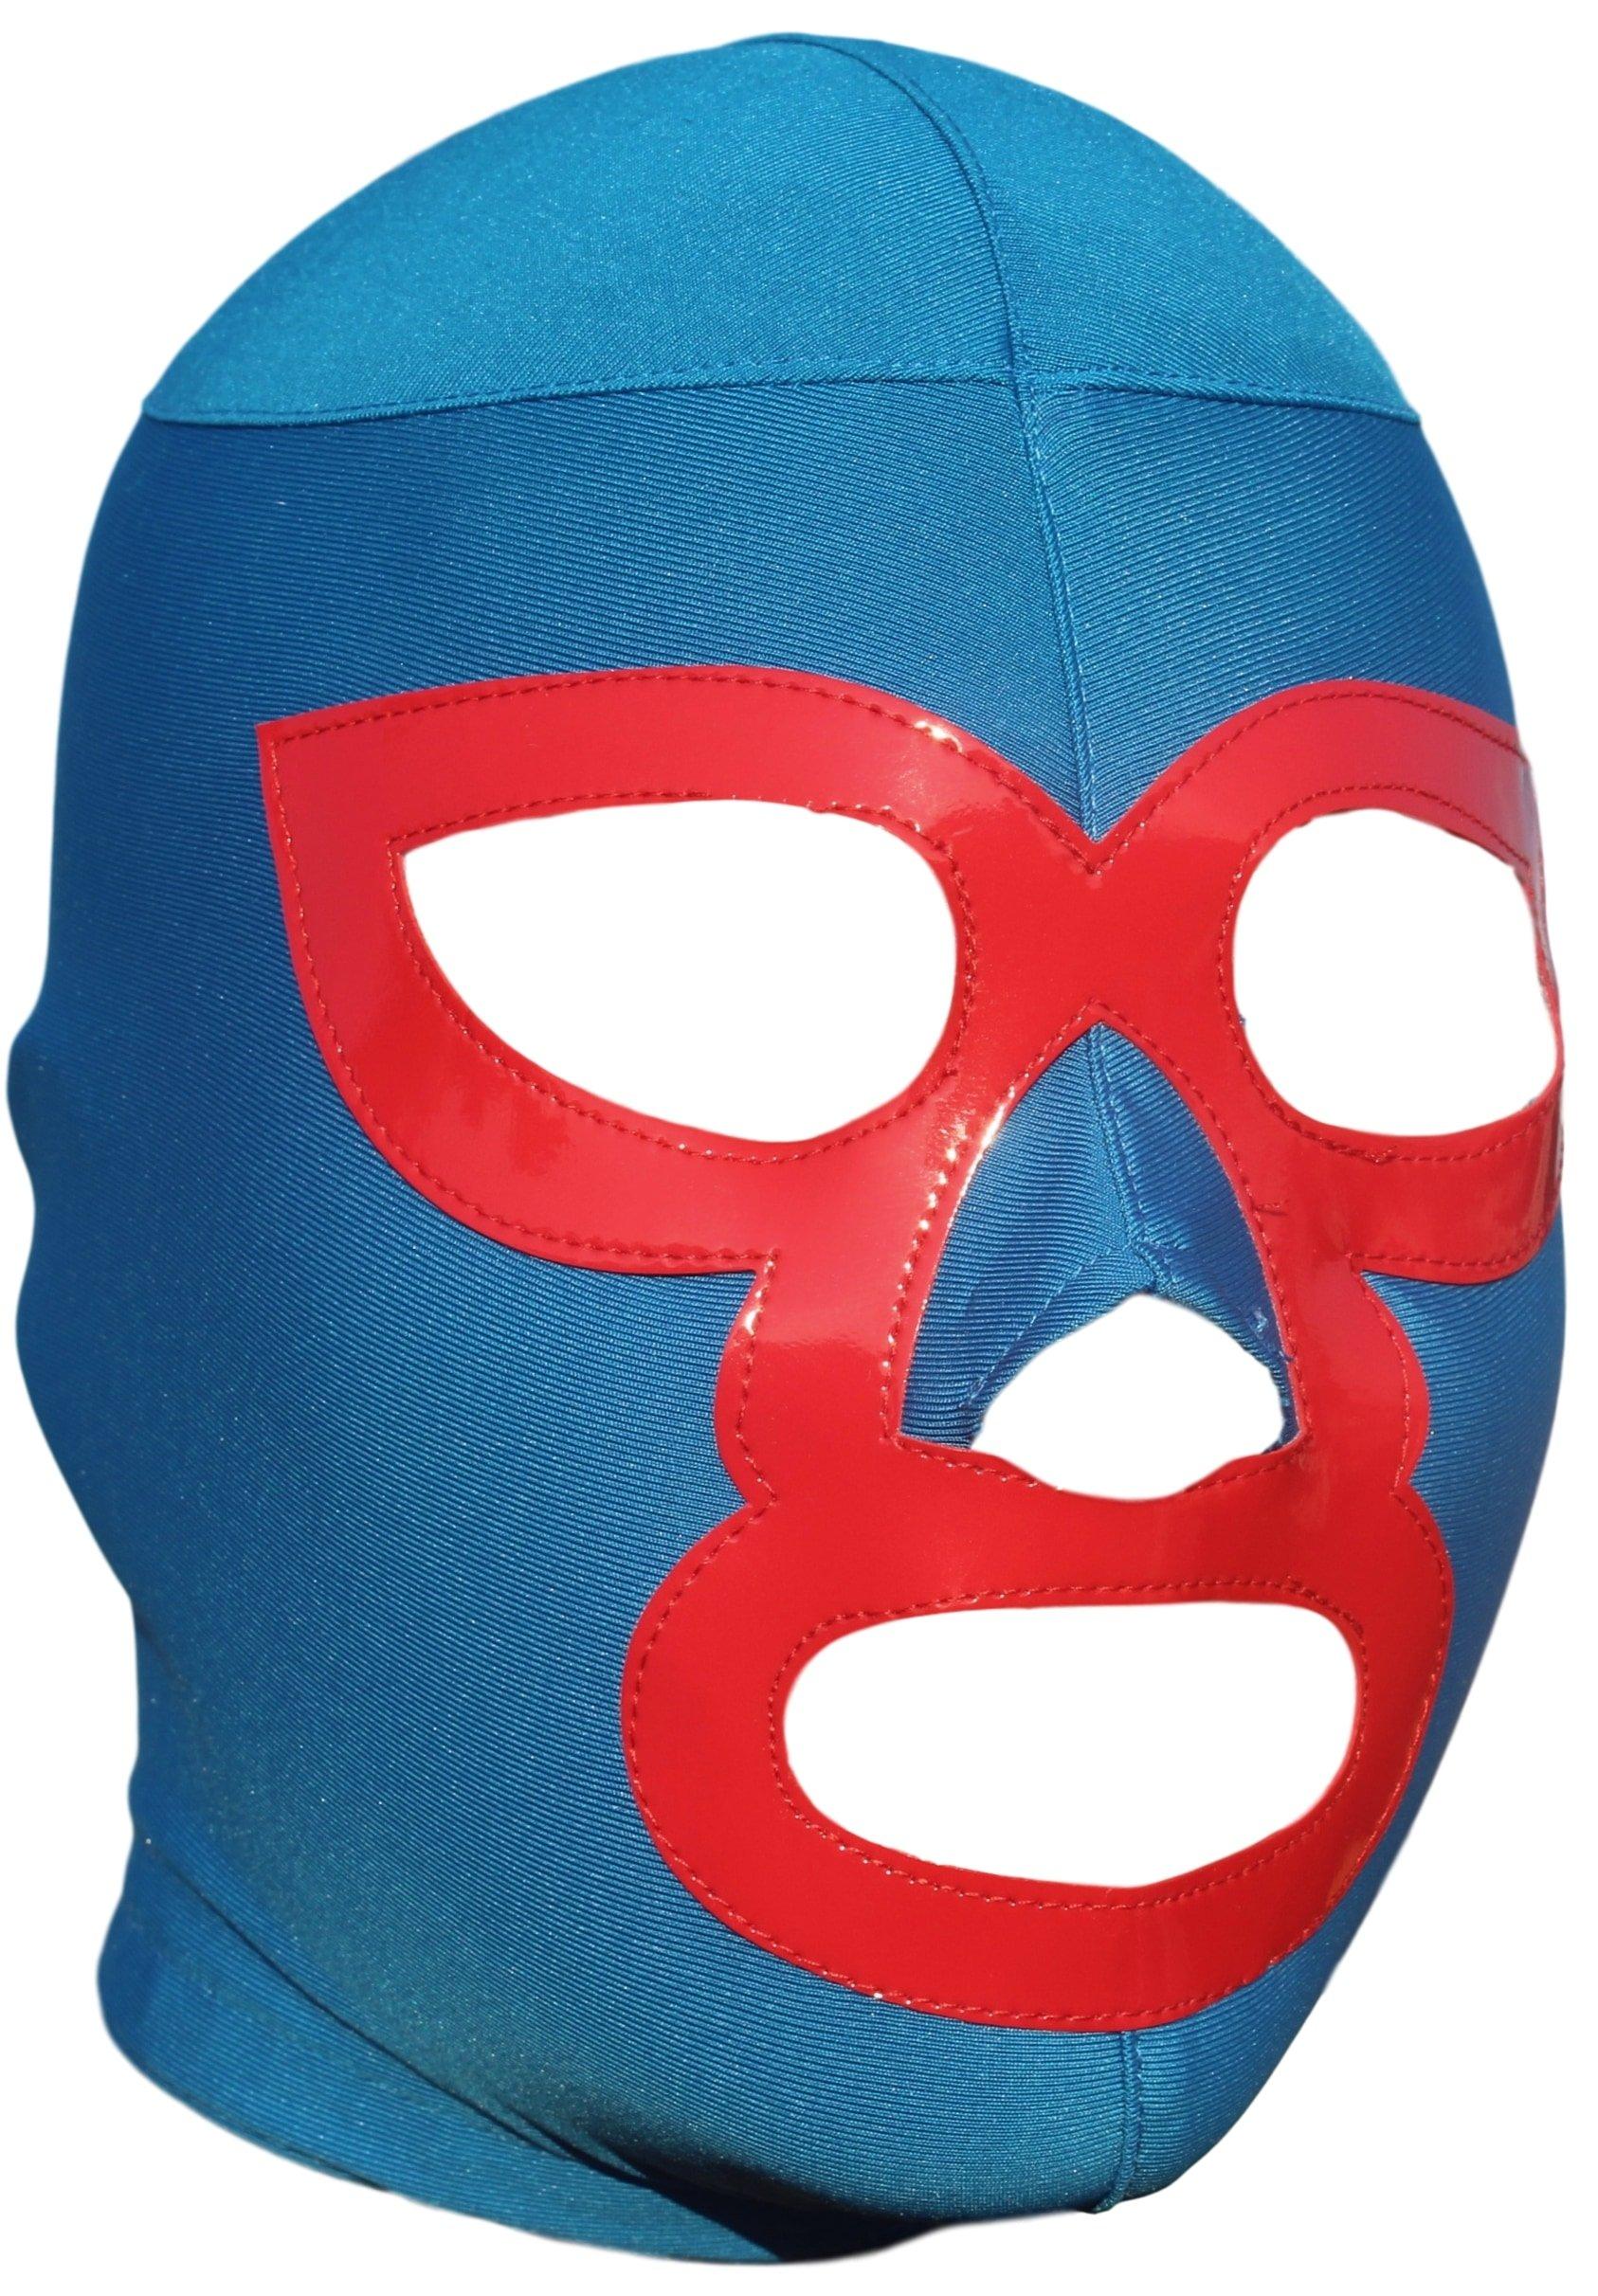 Deportes Martinez Nacho Libre Lycra Lucha Libre Luchador Wrestling Masks Adult Size by Deportes Martinez